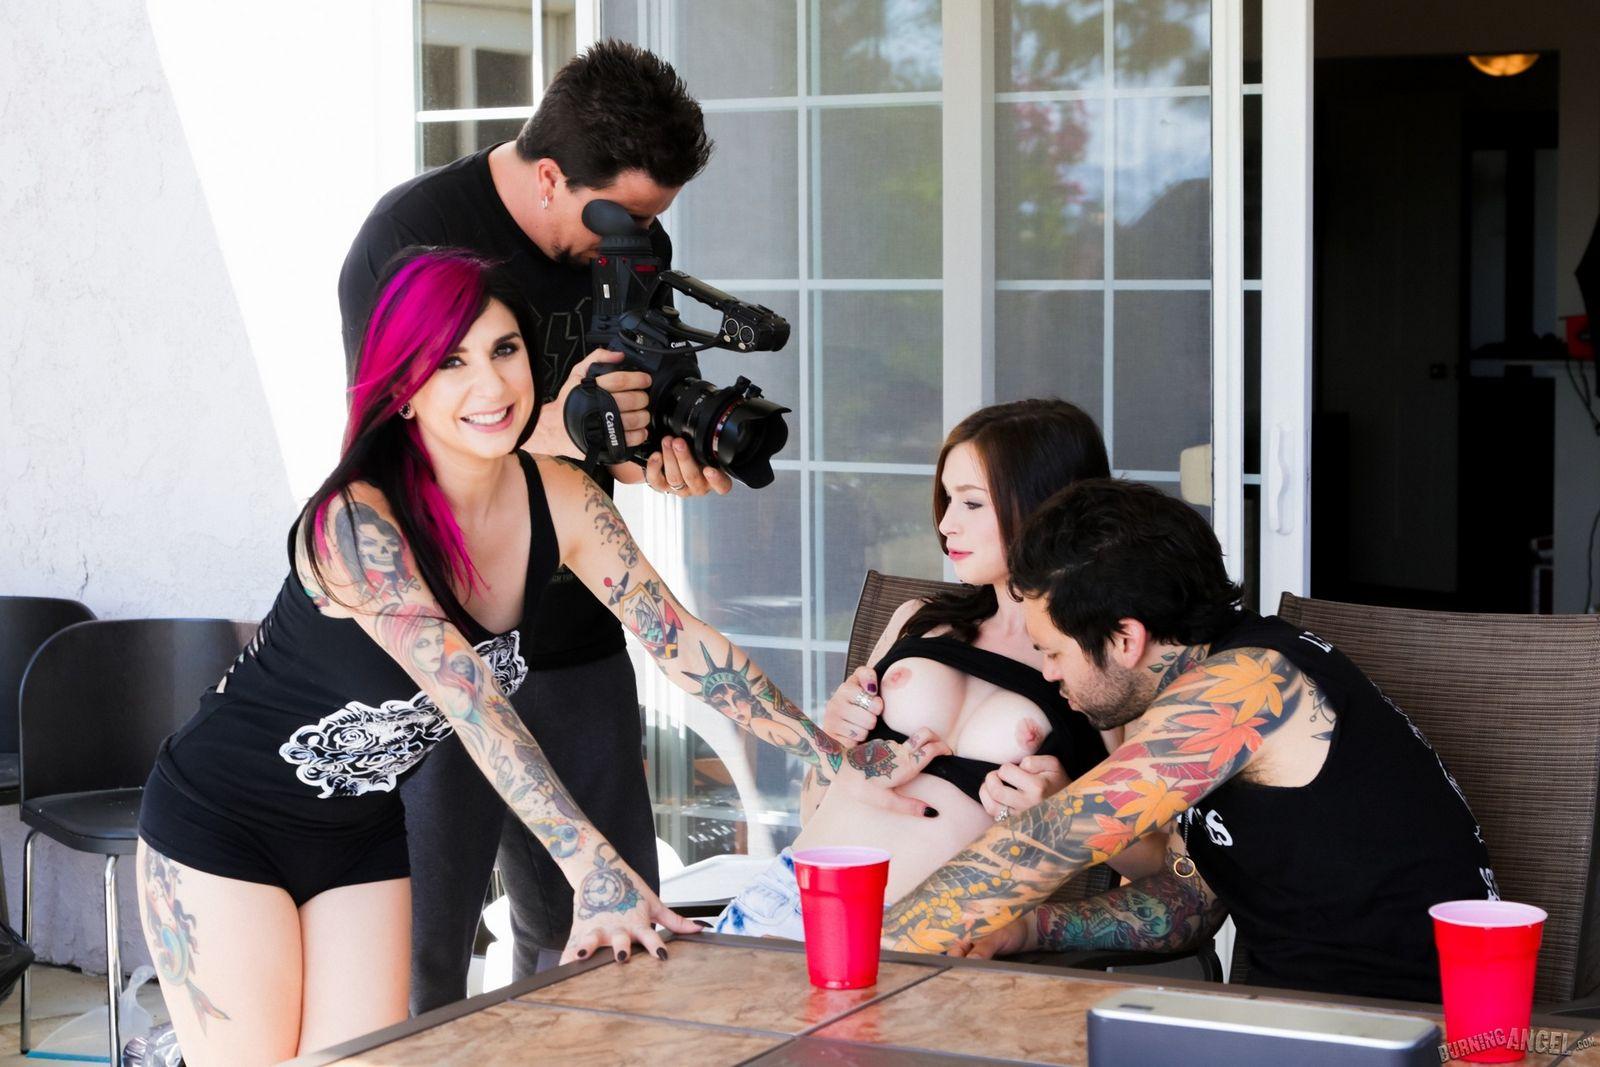 Отодрал на веранде 2-х татуированных девок